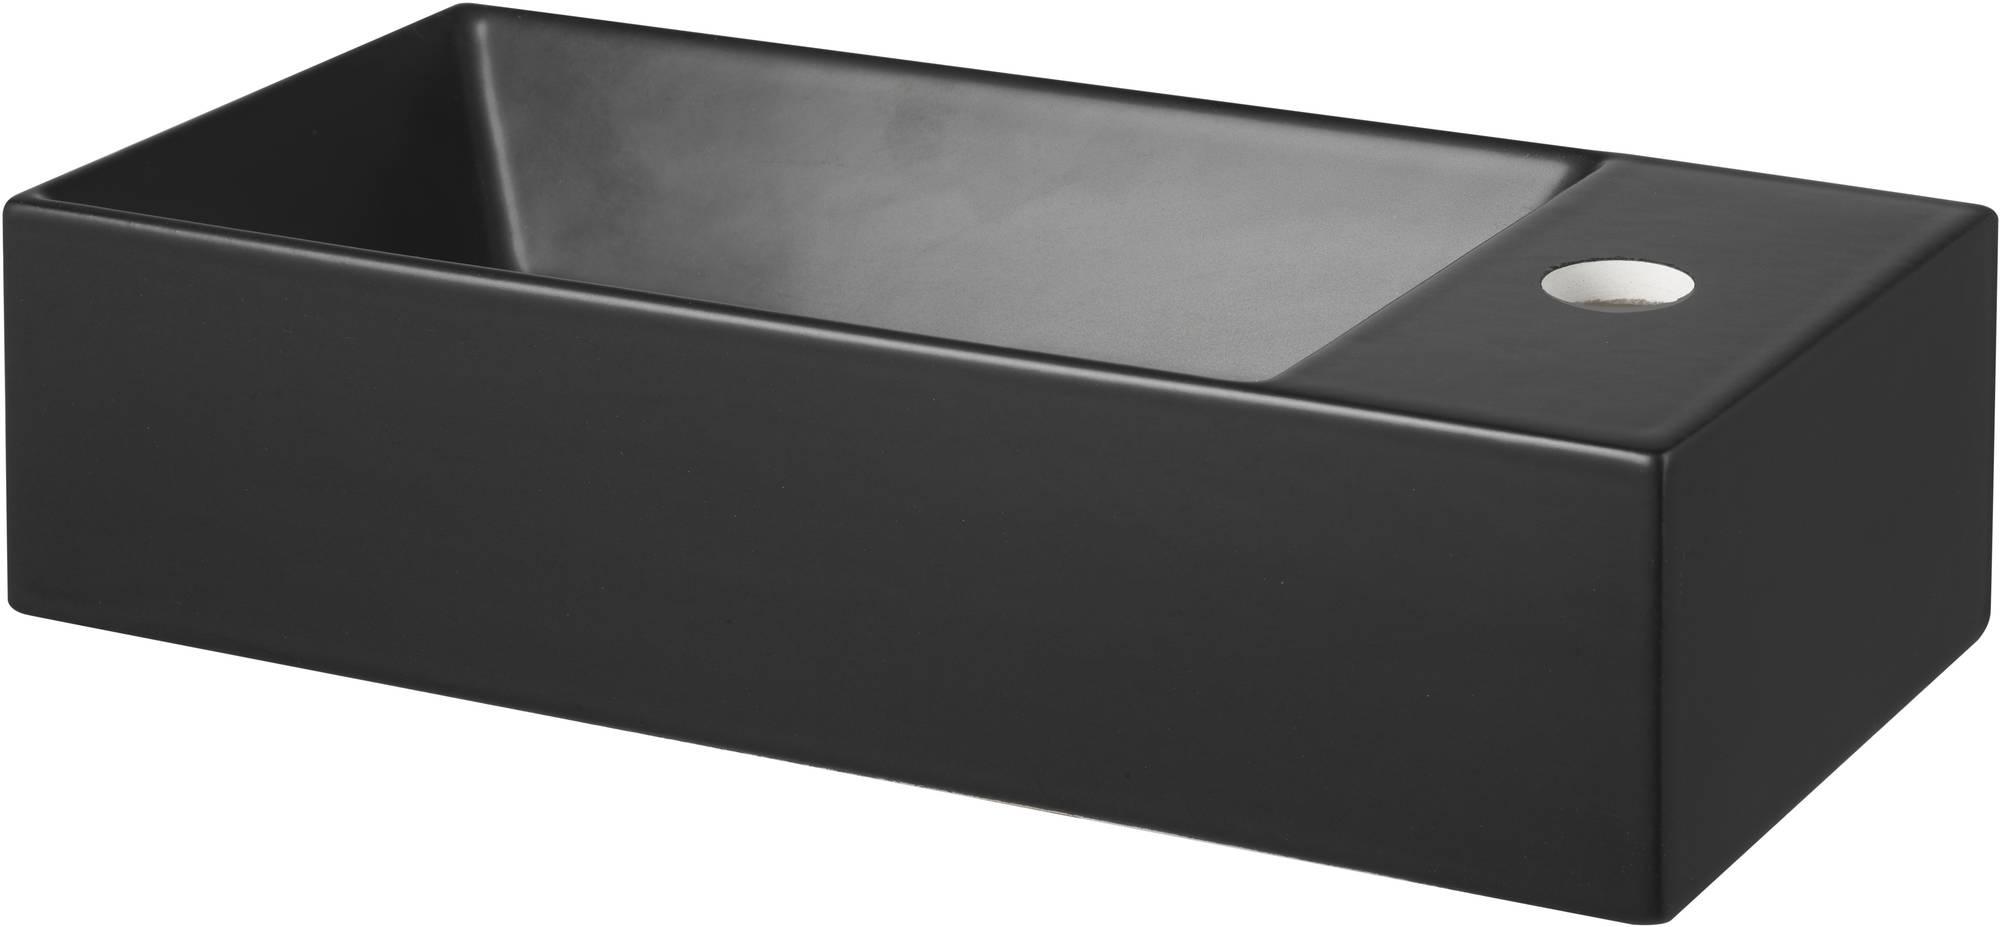 Saniselect Poggio Fontein 45x20x11 cm 1 Krg. Rechts Mat Zwart